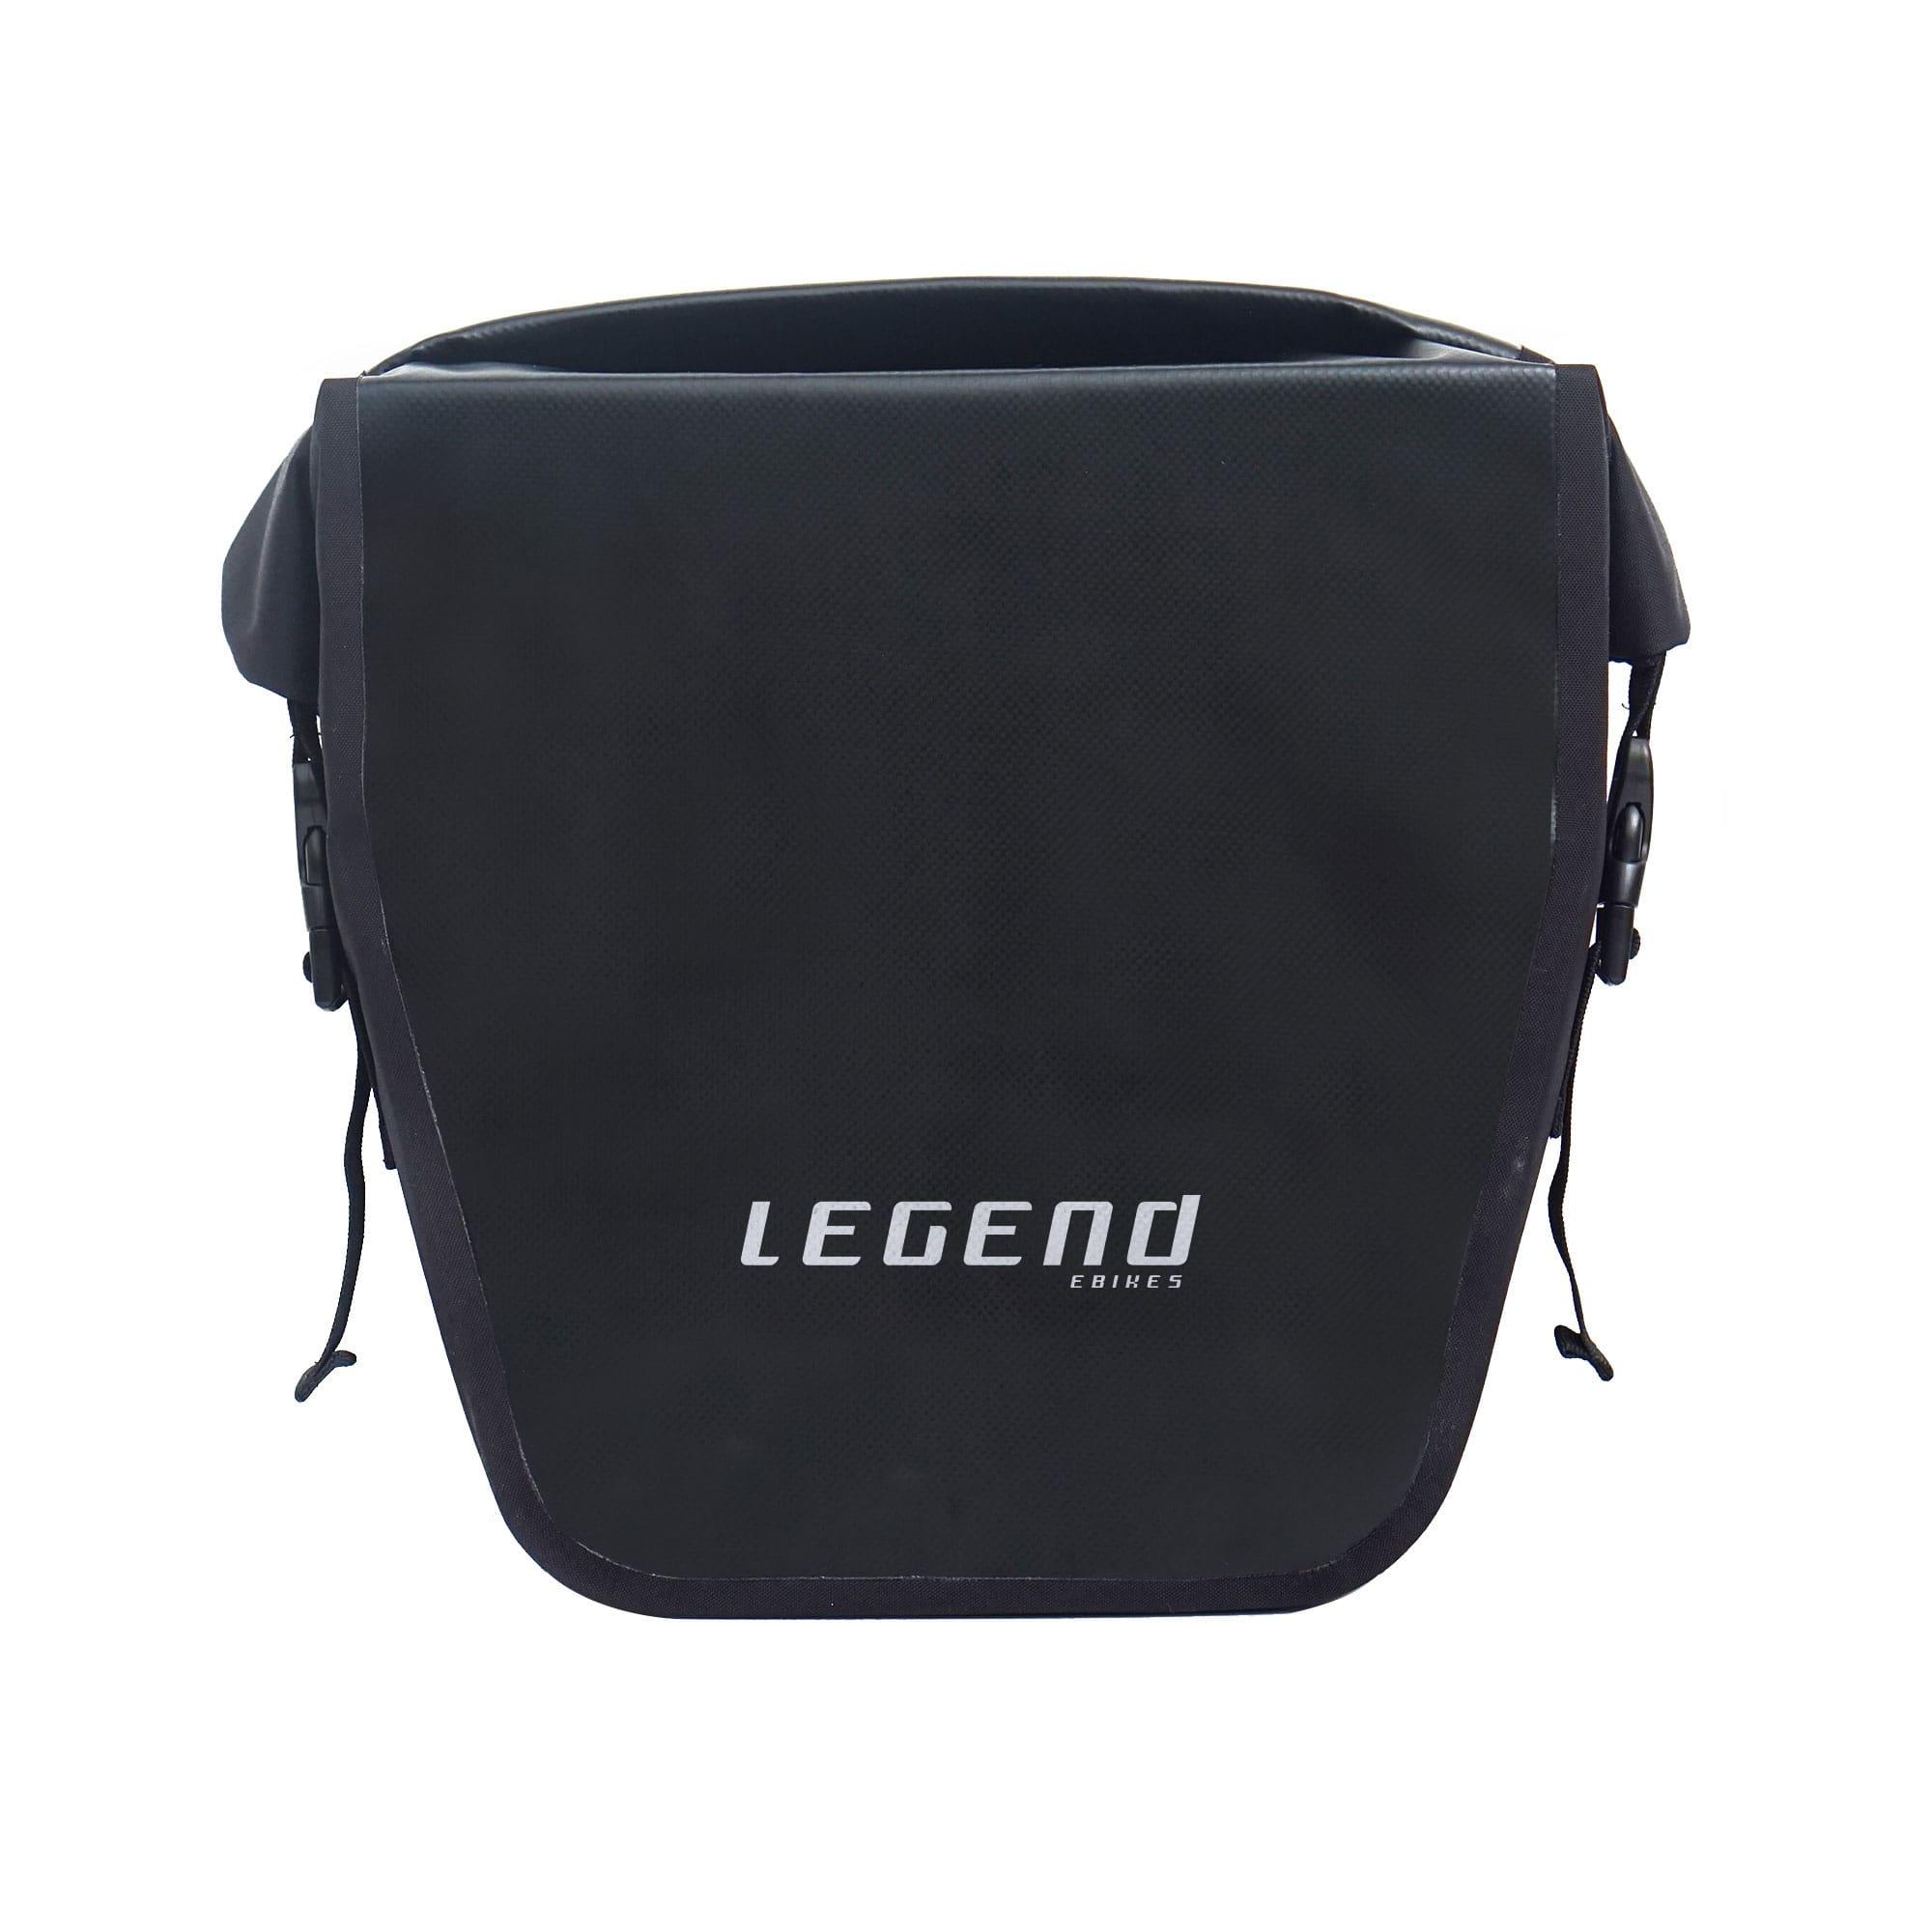 Legend waterproof large pannier bag 1 bag black